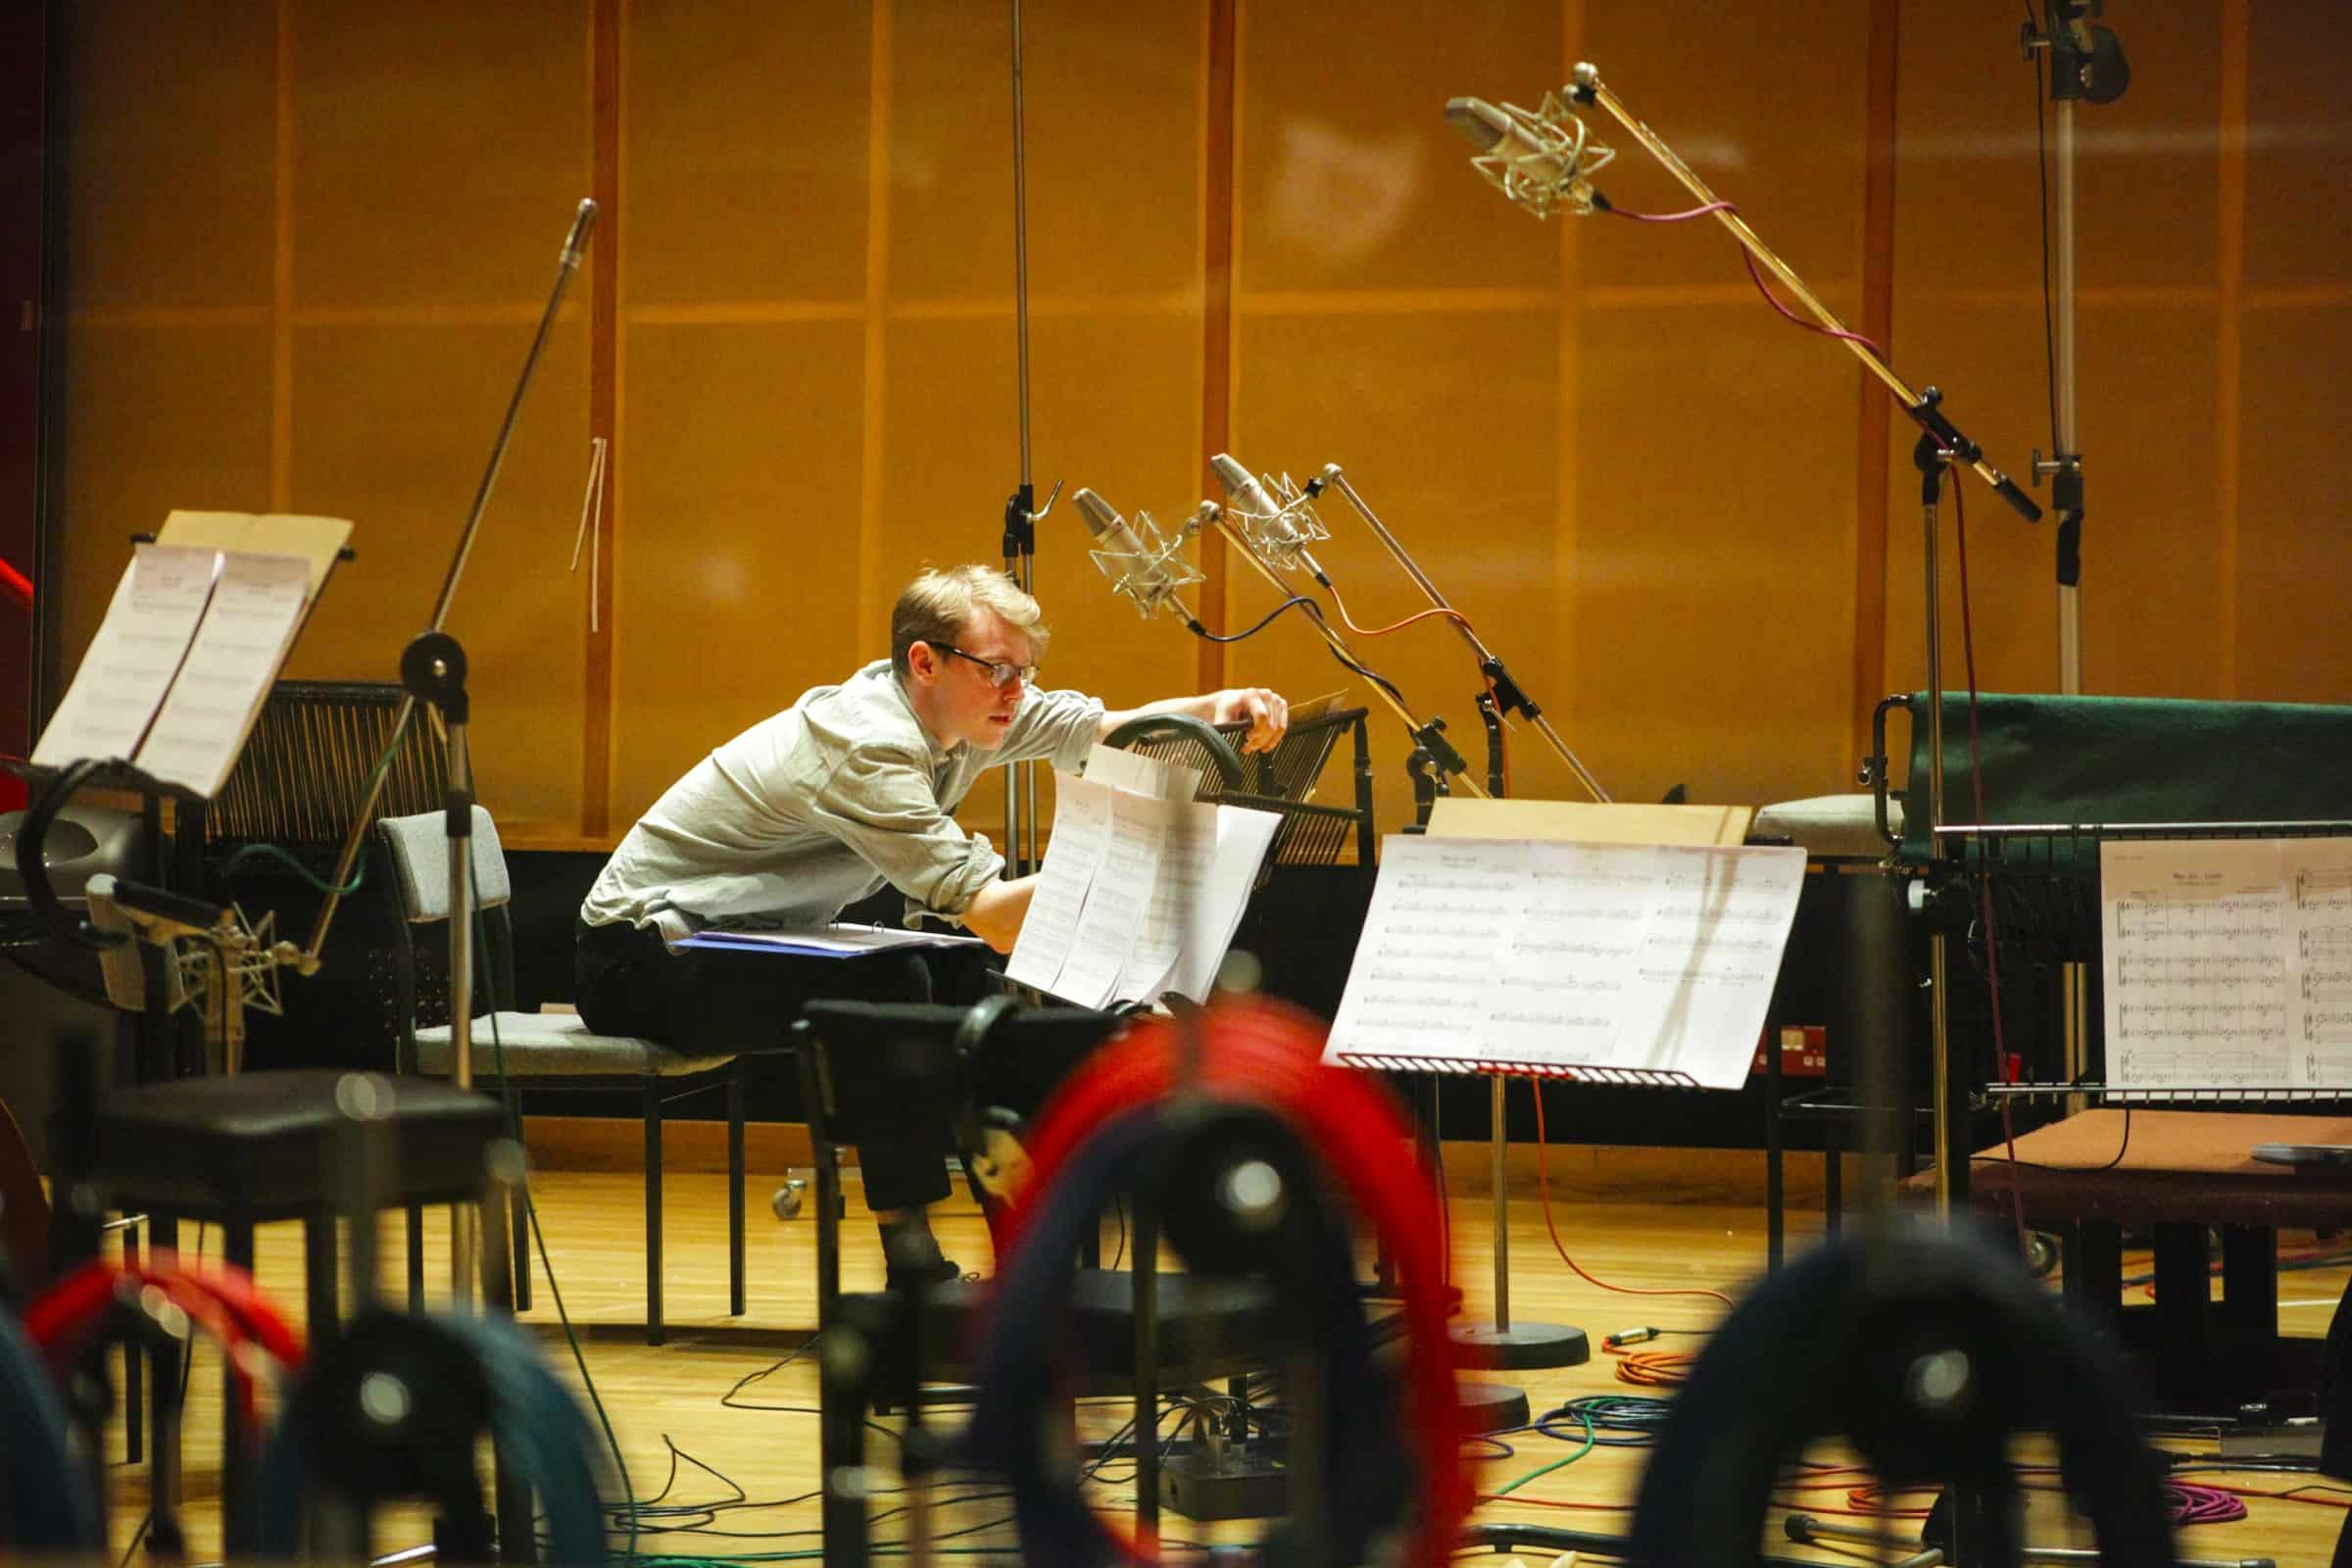 Composer Finn Keane at WAR ART recording session. Photograph © www.foxtrotfilms.com